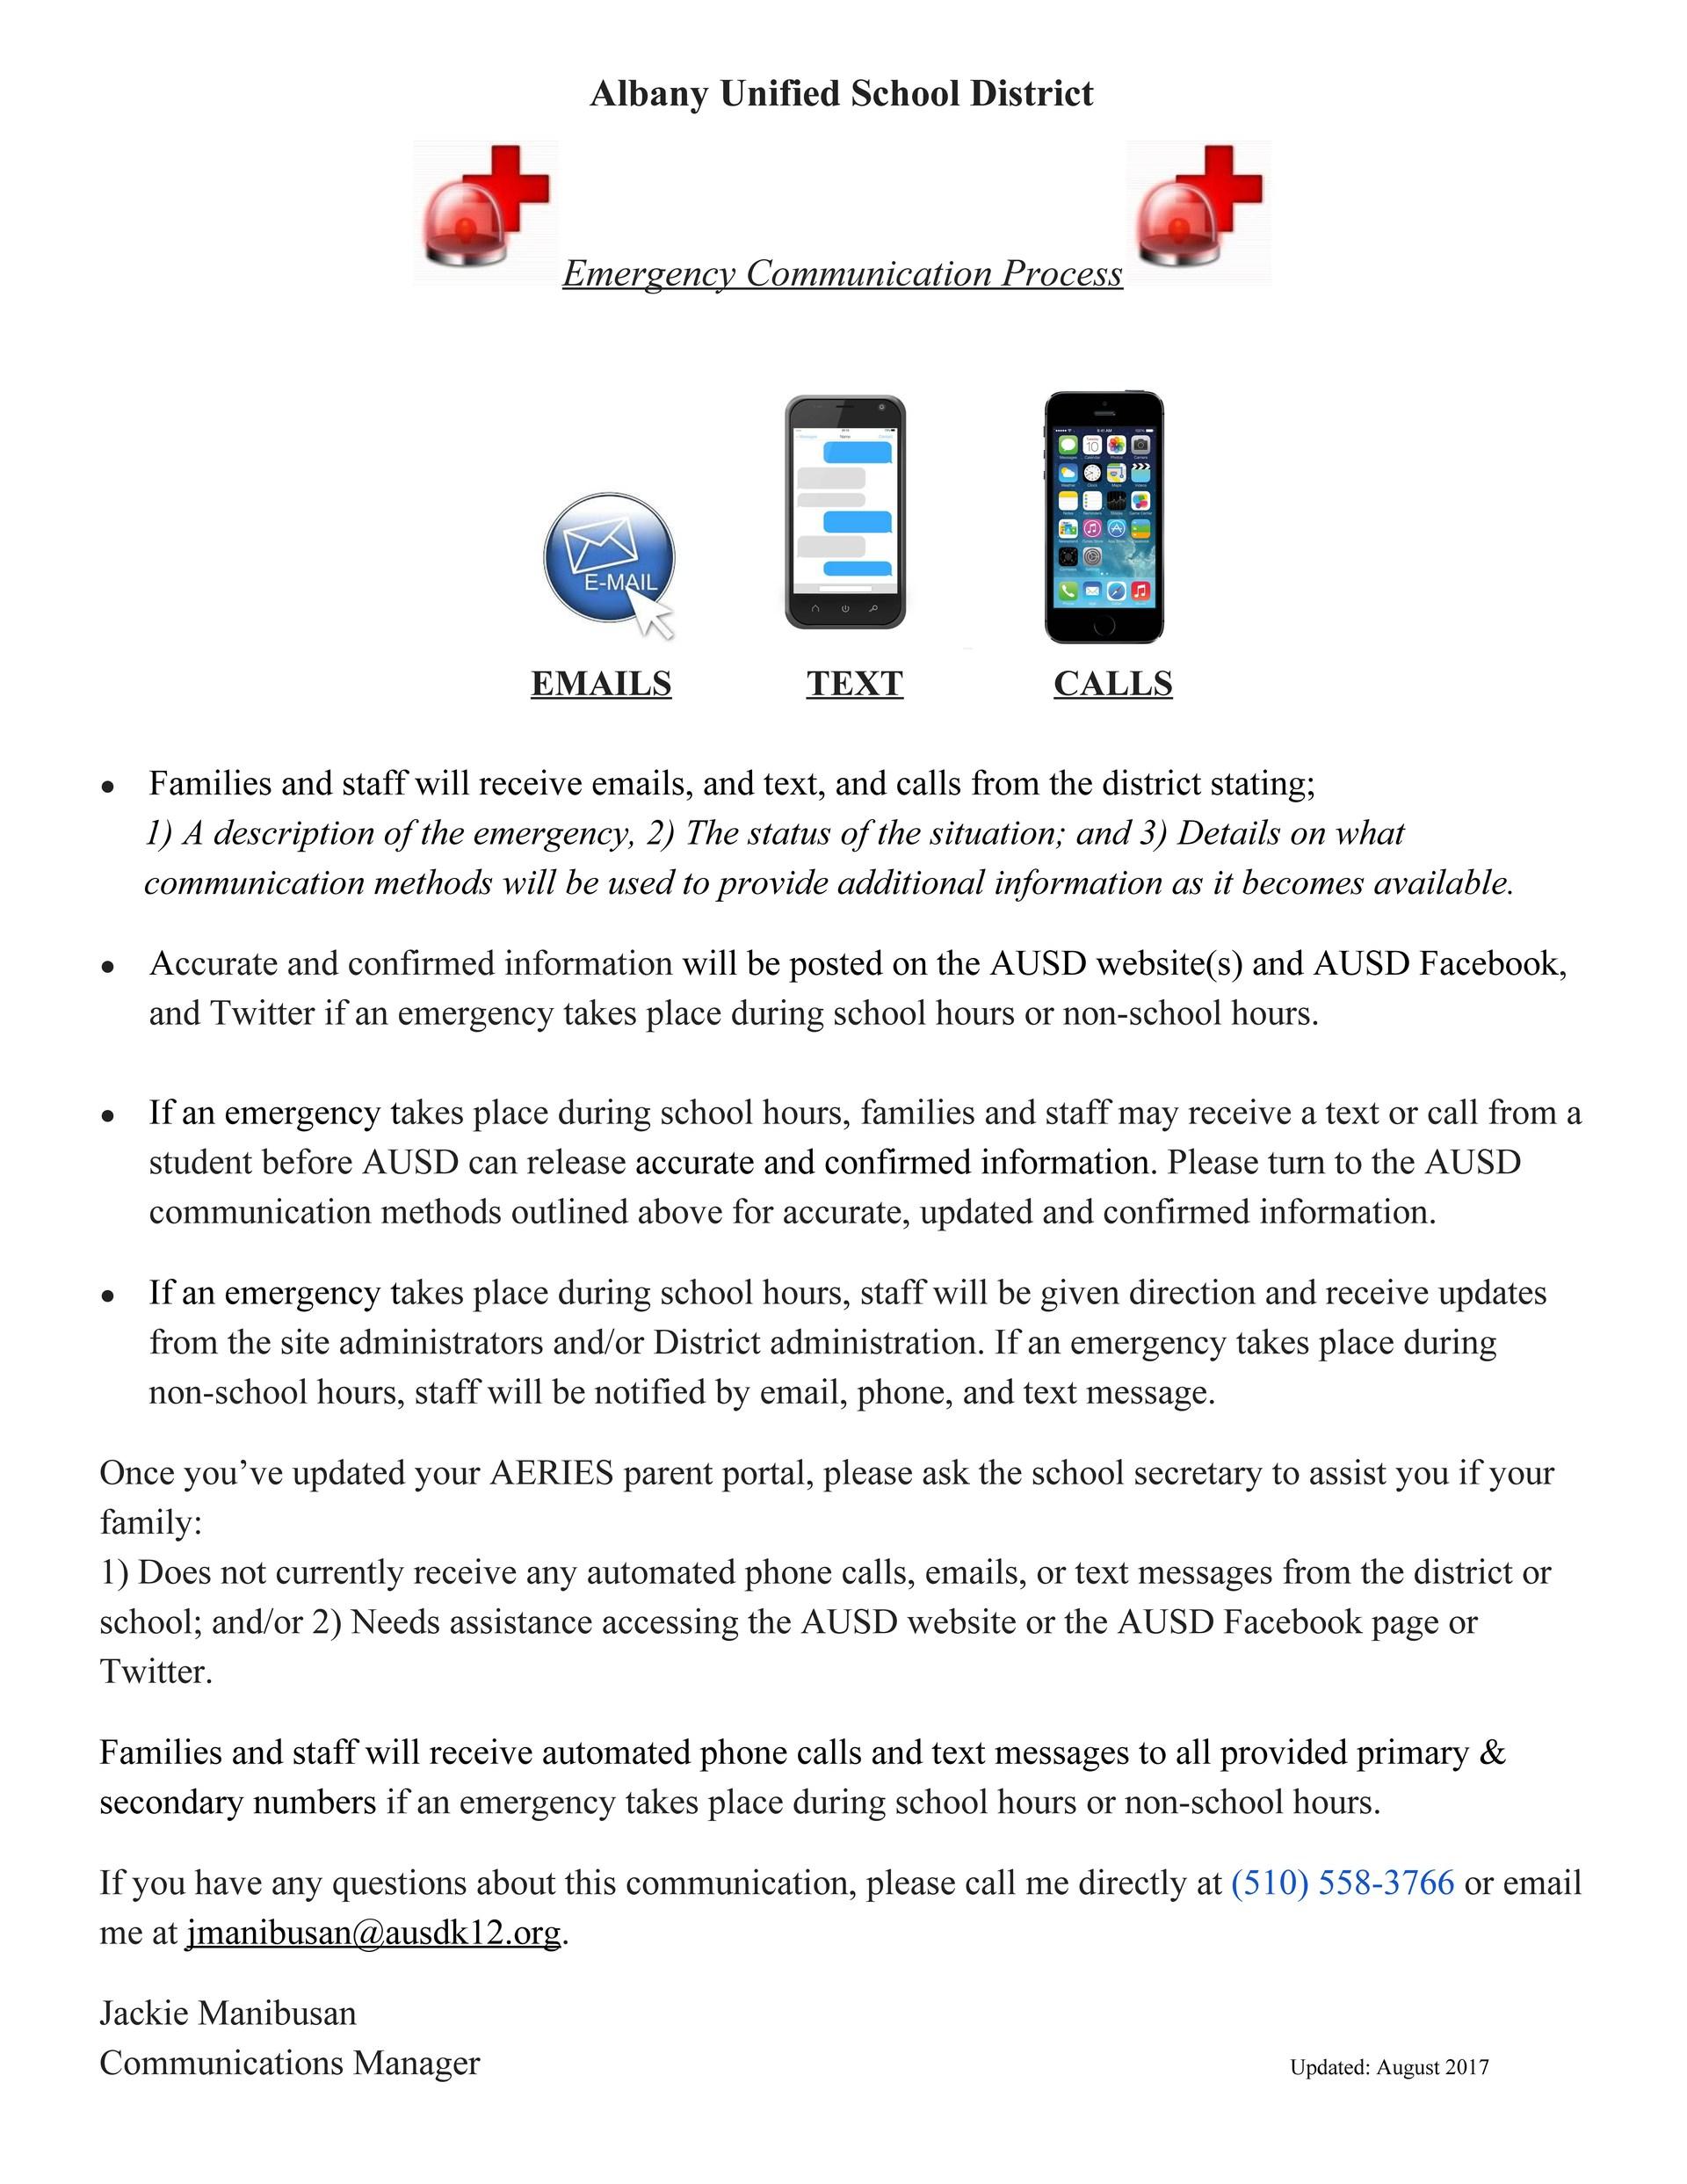 Emergency Communication Process Updated